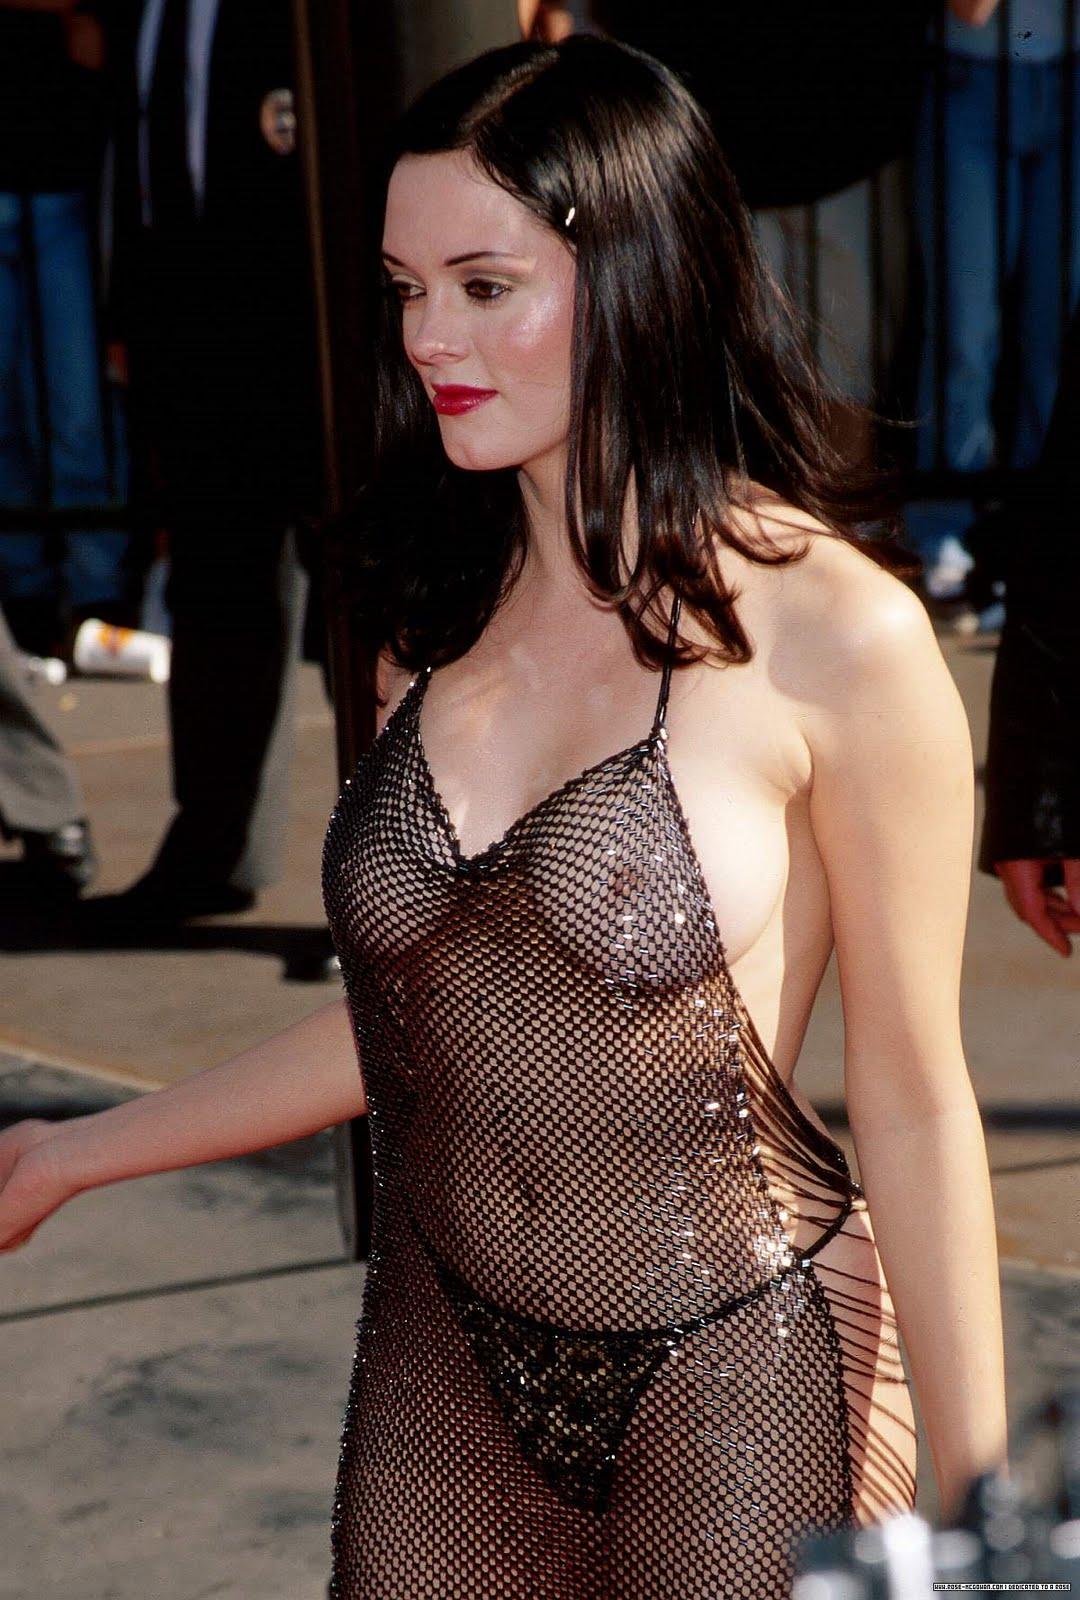 http://2.bp.blogspot.com/_2B7BaGF-KAw/S7sLgnB-VSI/AAAAAAAAAjI/tdRpr9oxwic/s1600/rose_mcgowan_98_mtv_awards_dress.jpg